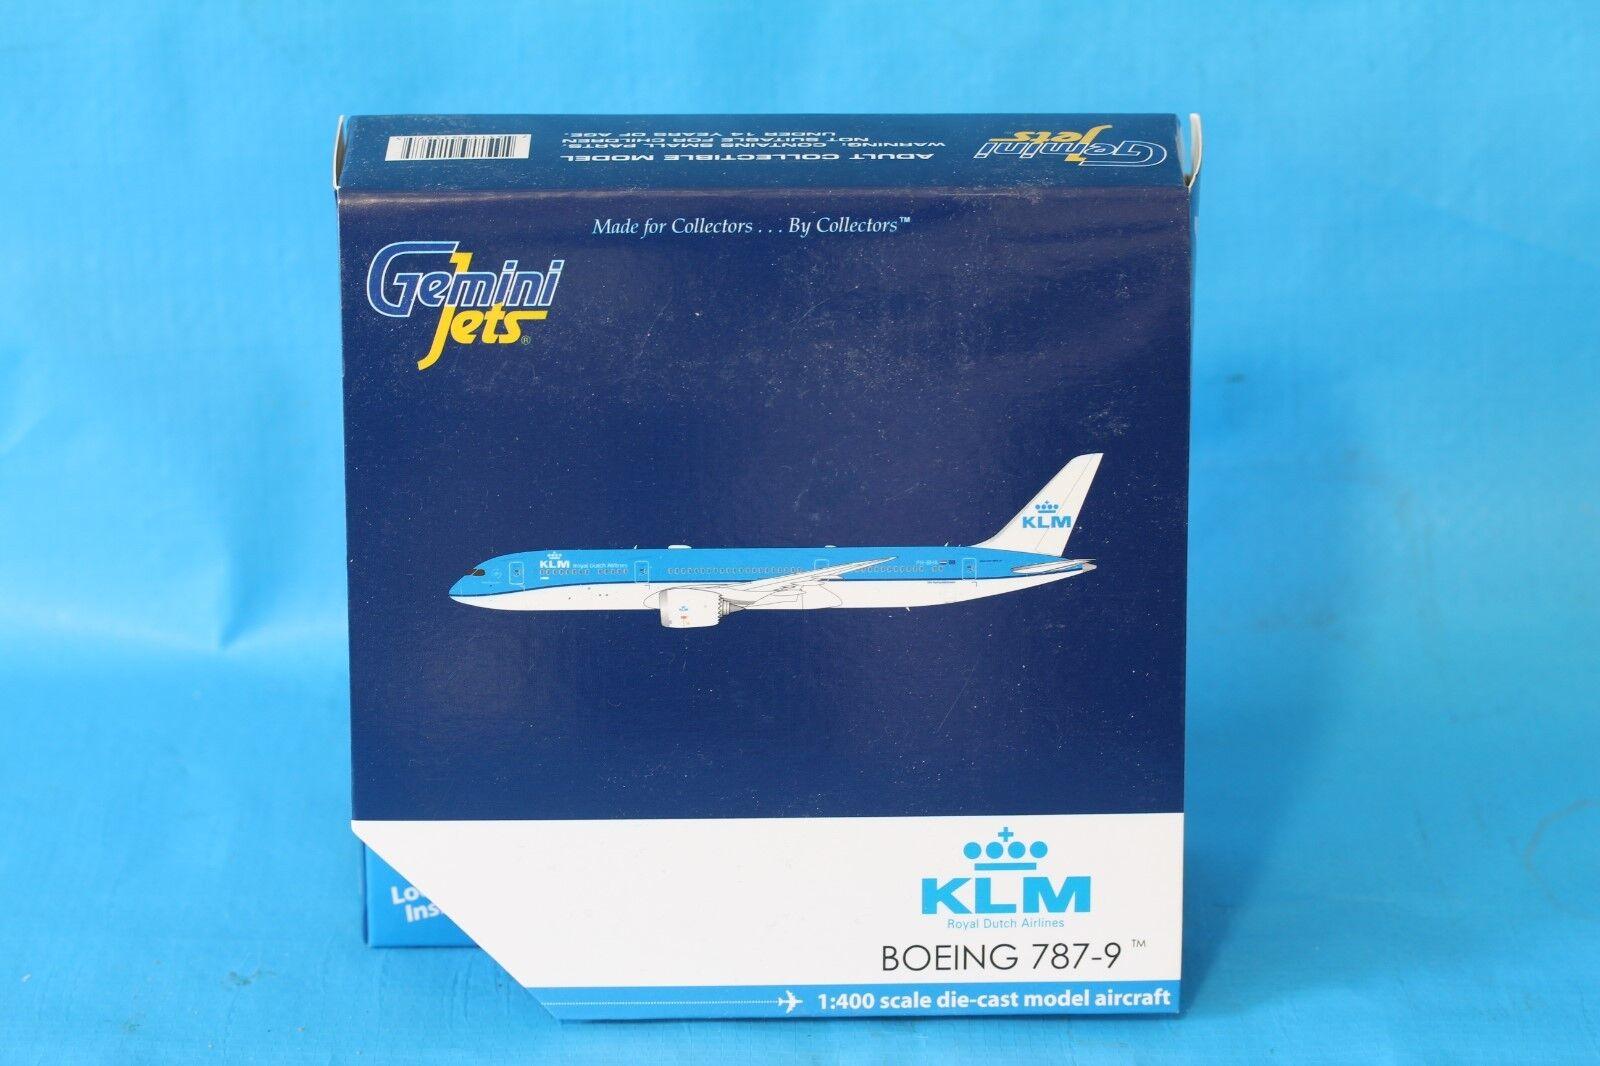 Neue gemini - jets 1 400 klm boeing 787-900 flugzeug gjklm1507 qantas - flugzeug